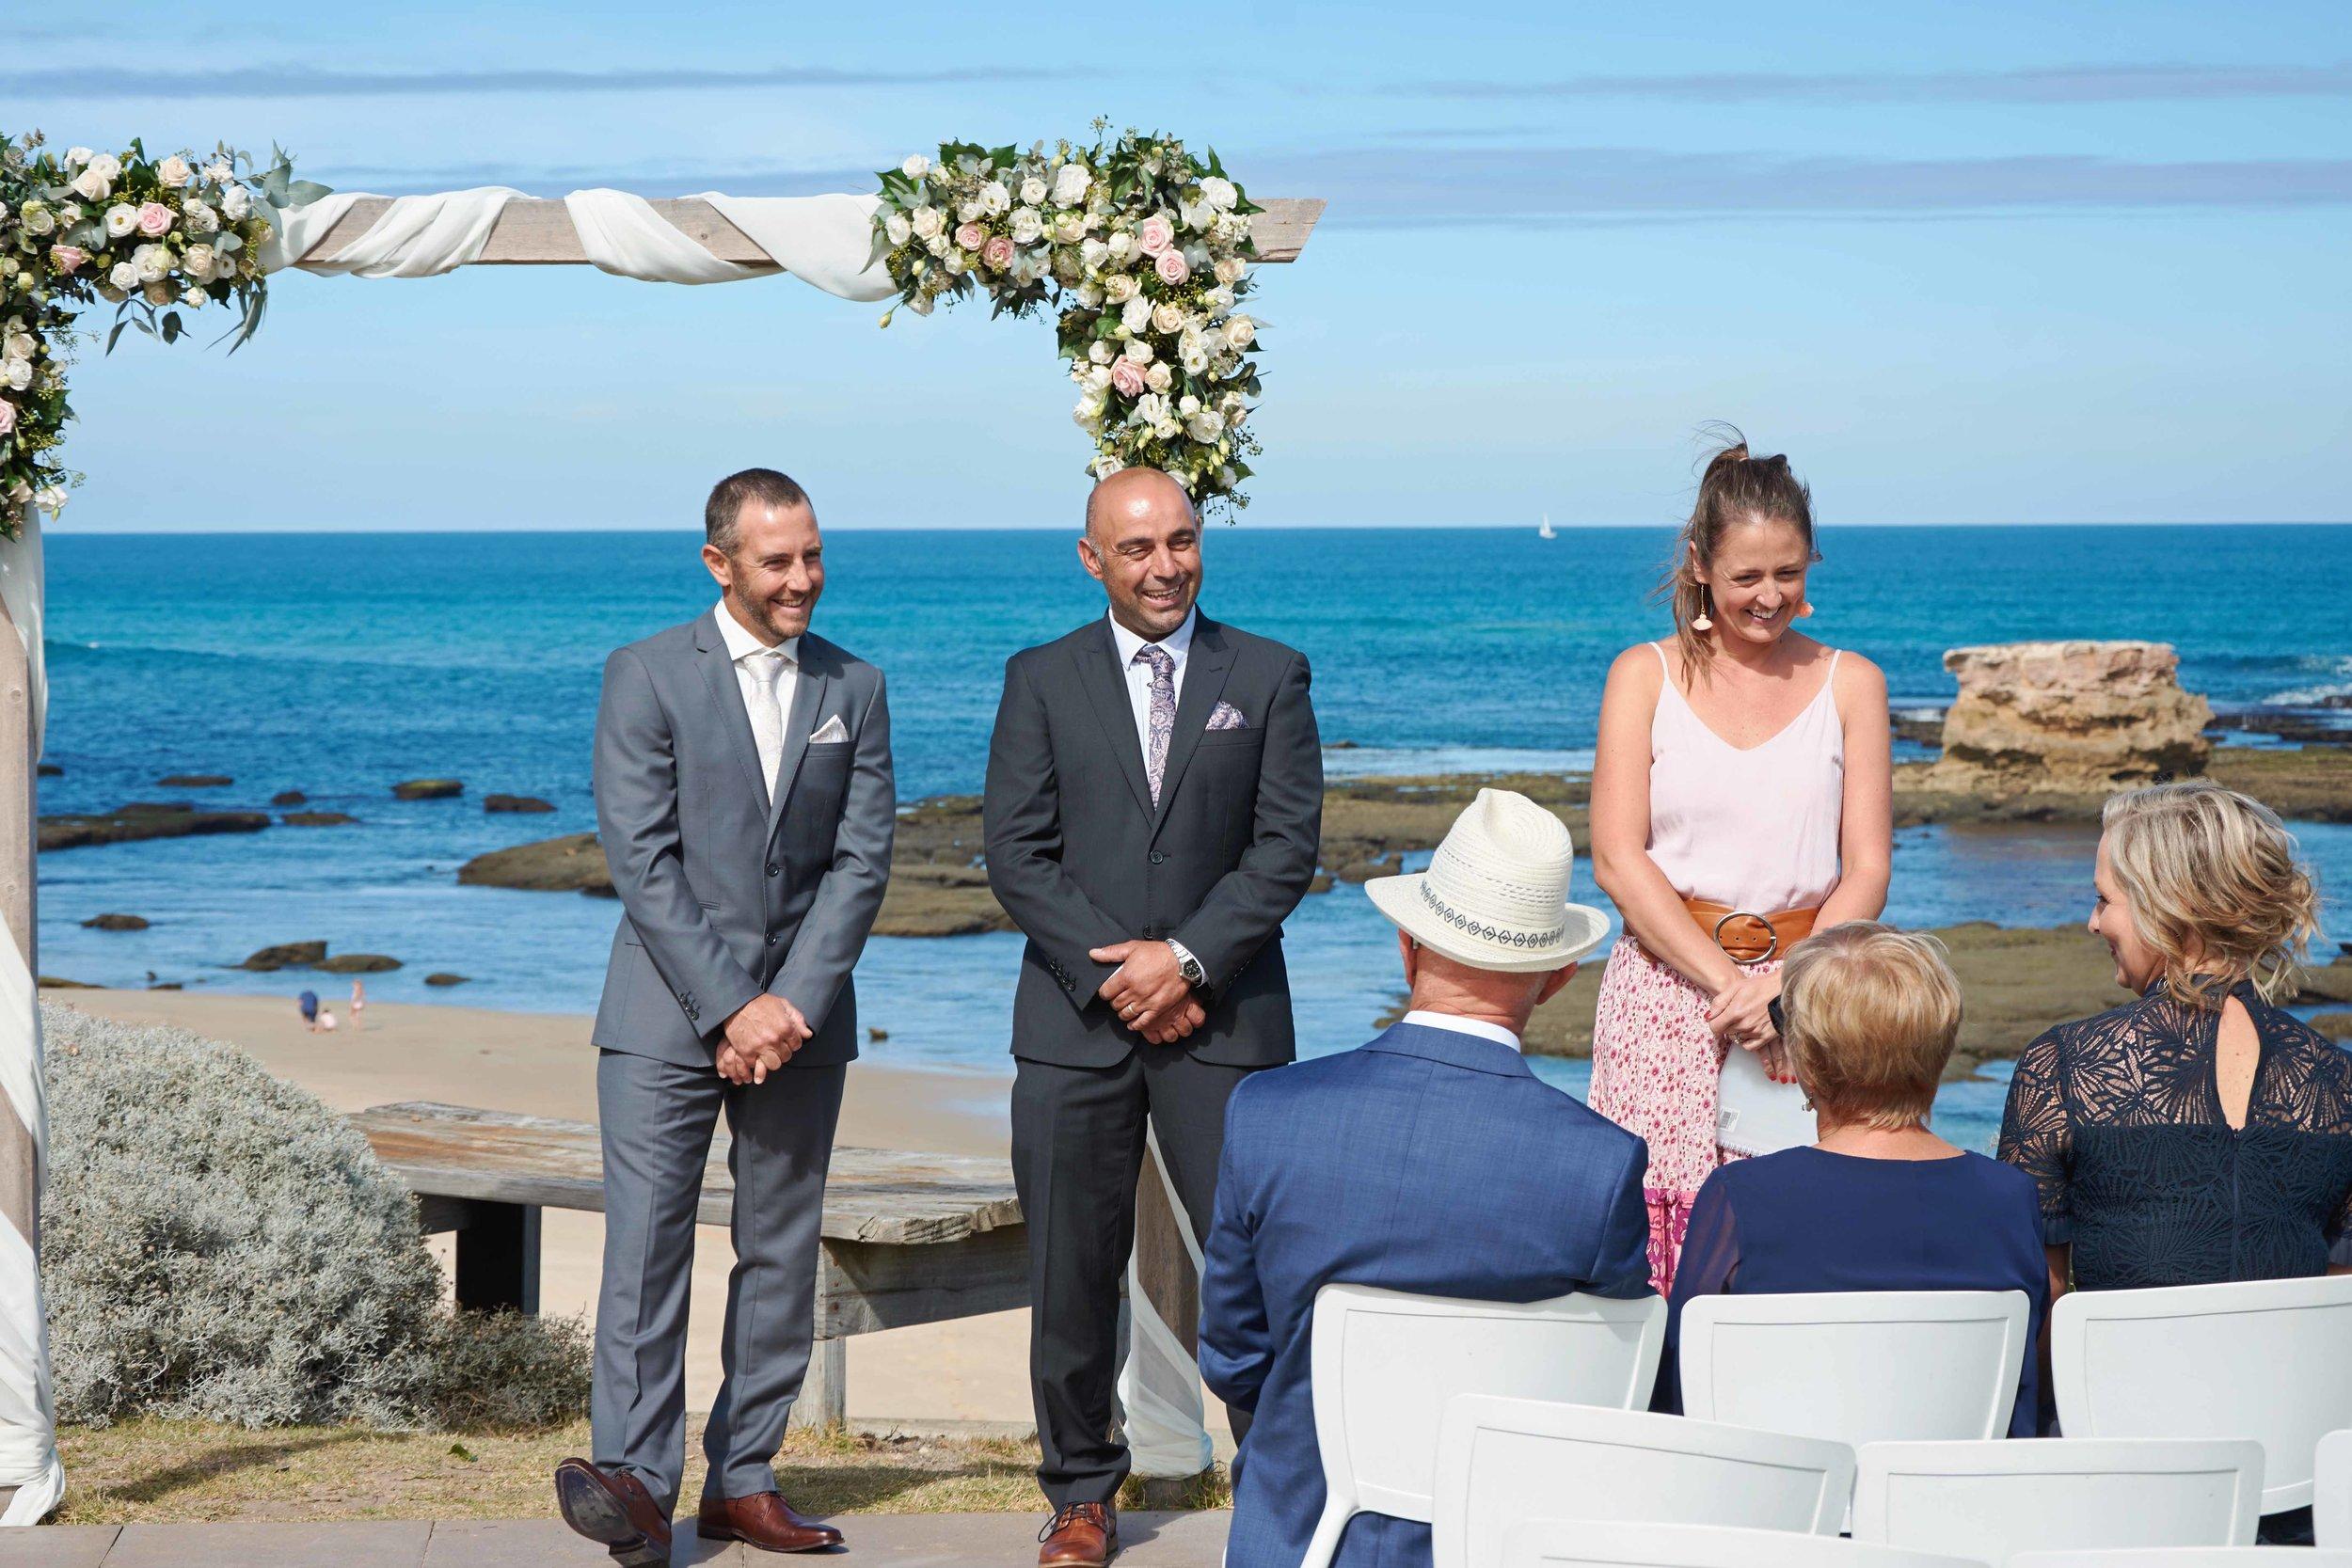 sorrento-wedding-photography-all-smiles-marissa-jade-photography-35.jpg